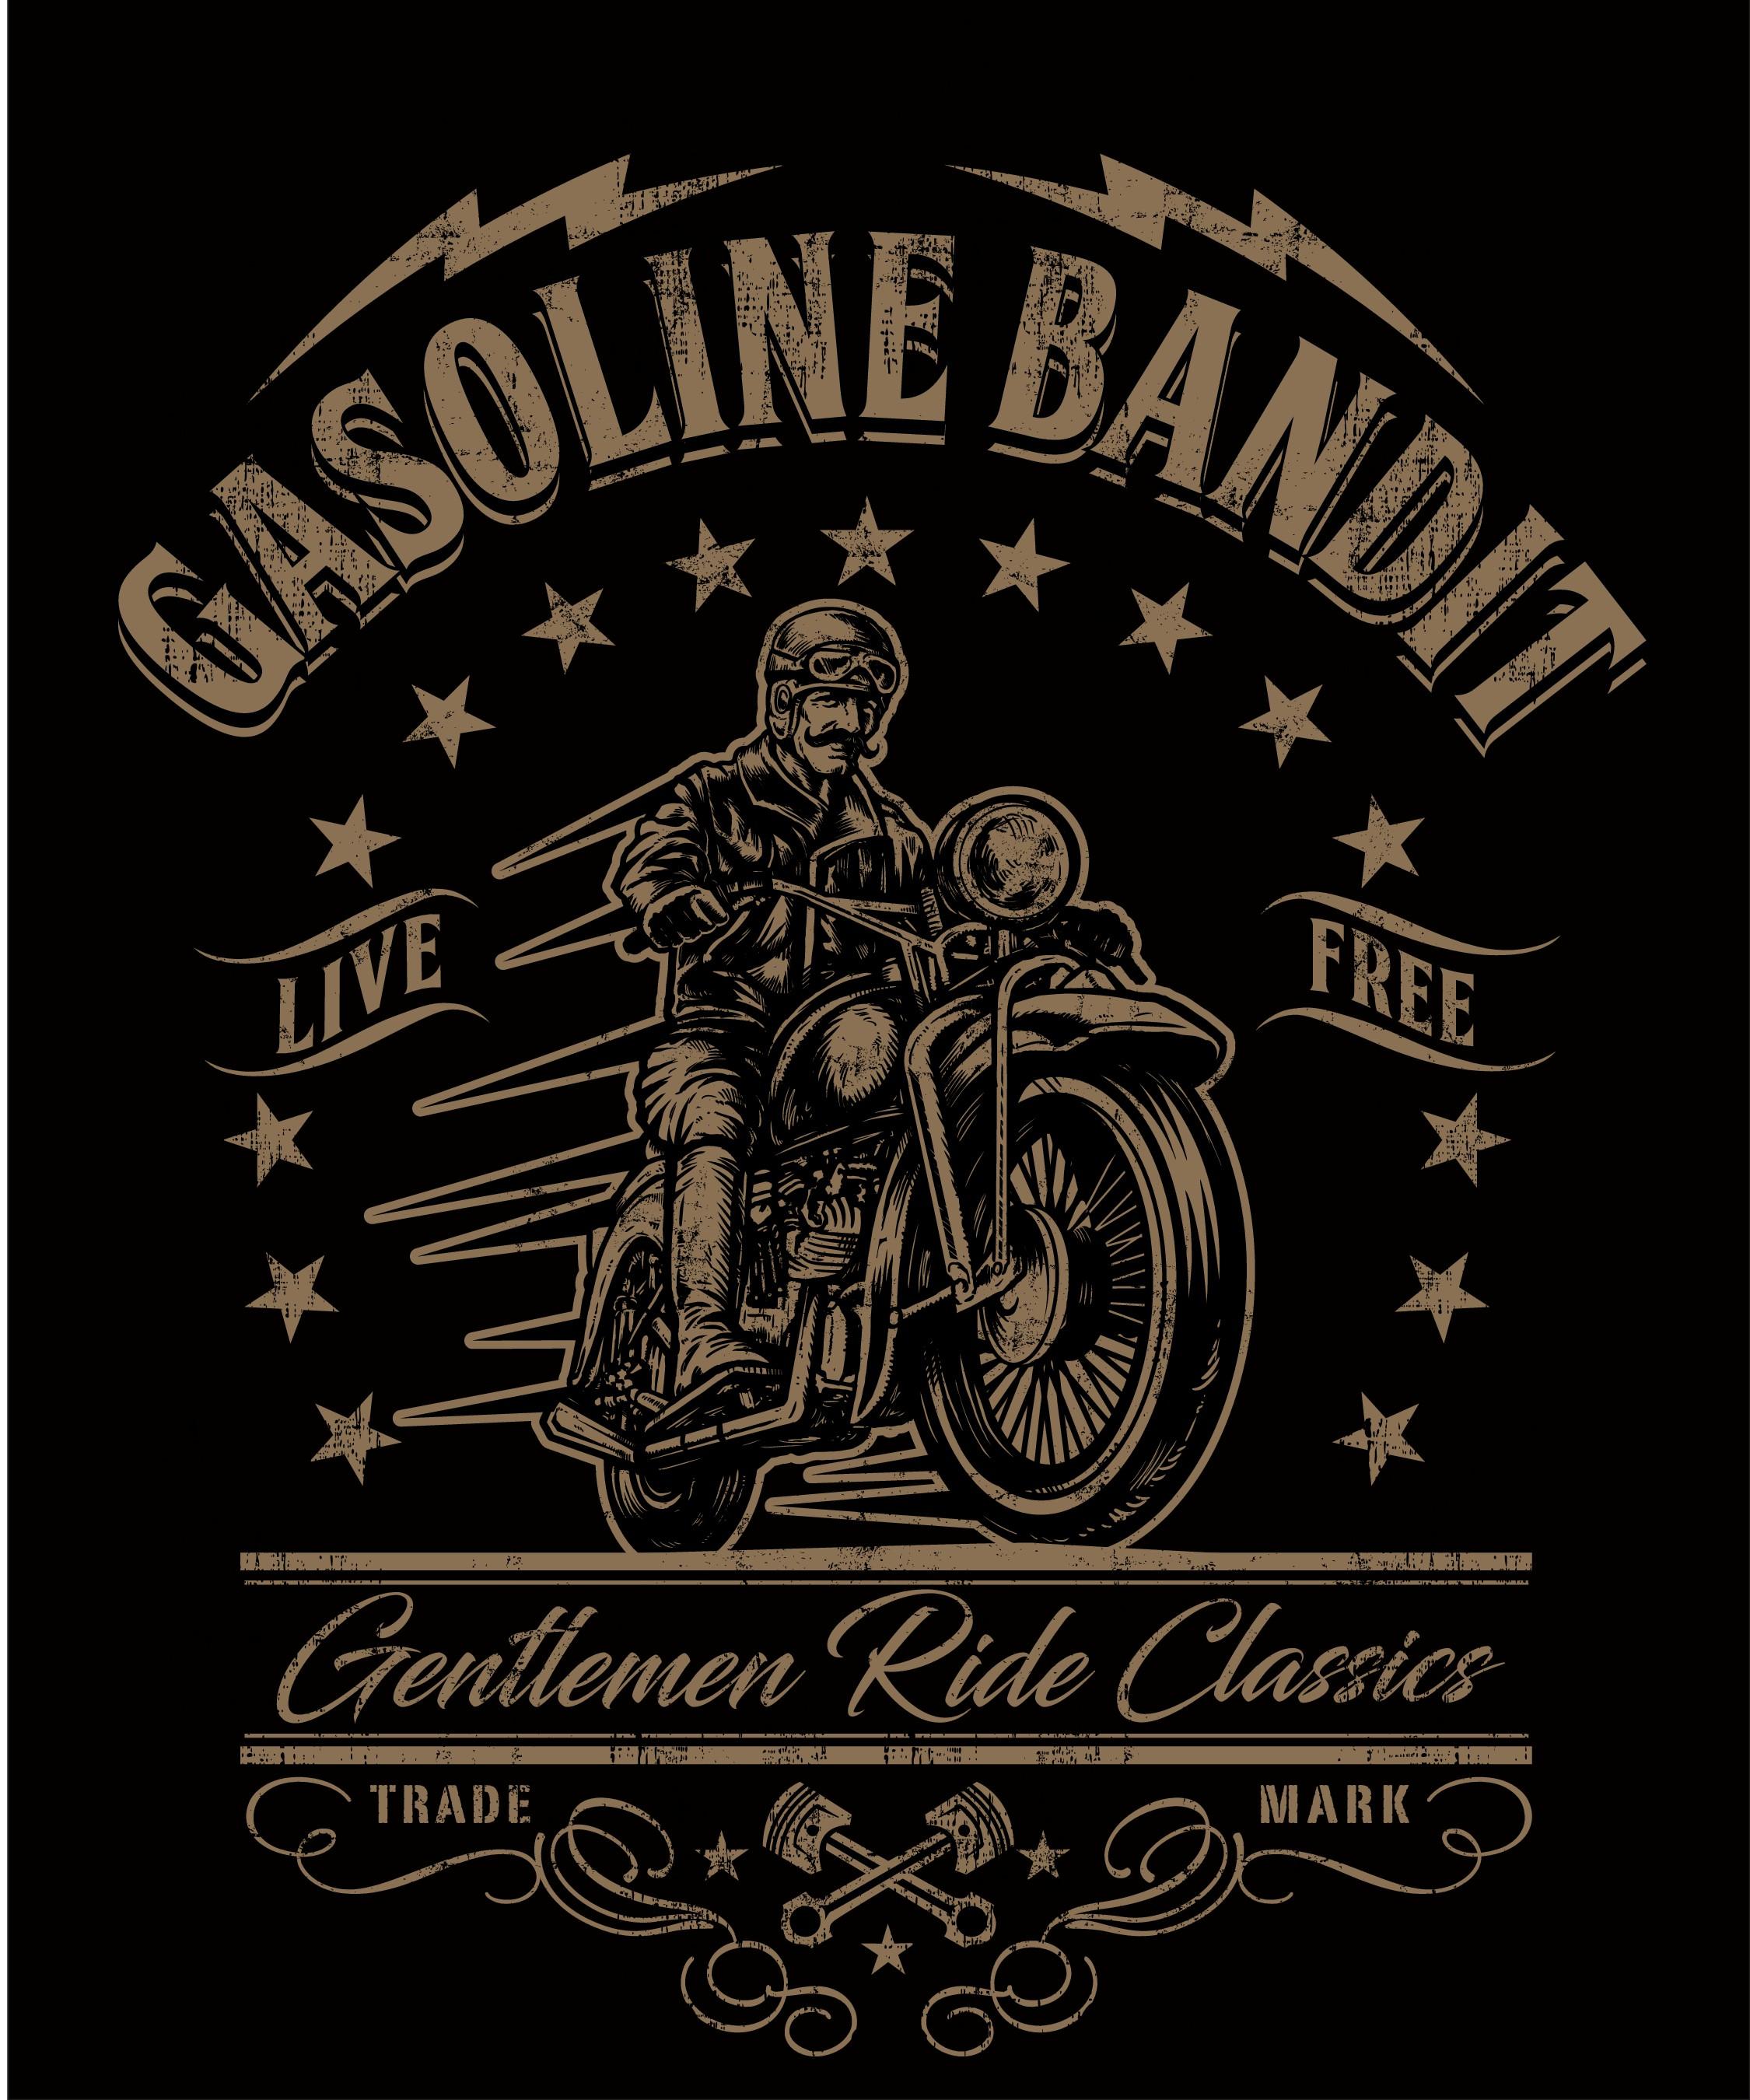 +++ Old fashioned Gentlemen-Biker T-Shirt - Create a cool vintage retro design+++